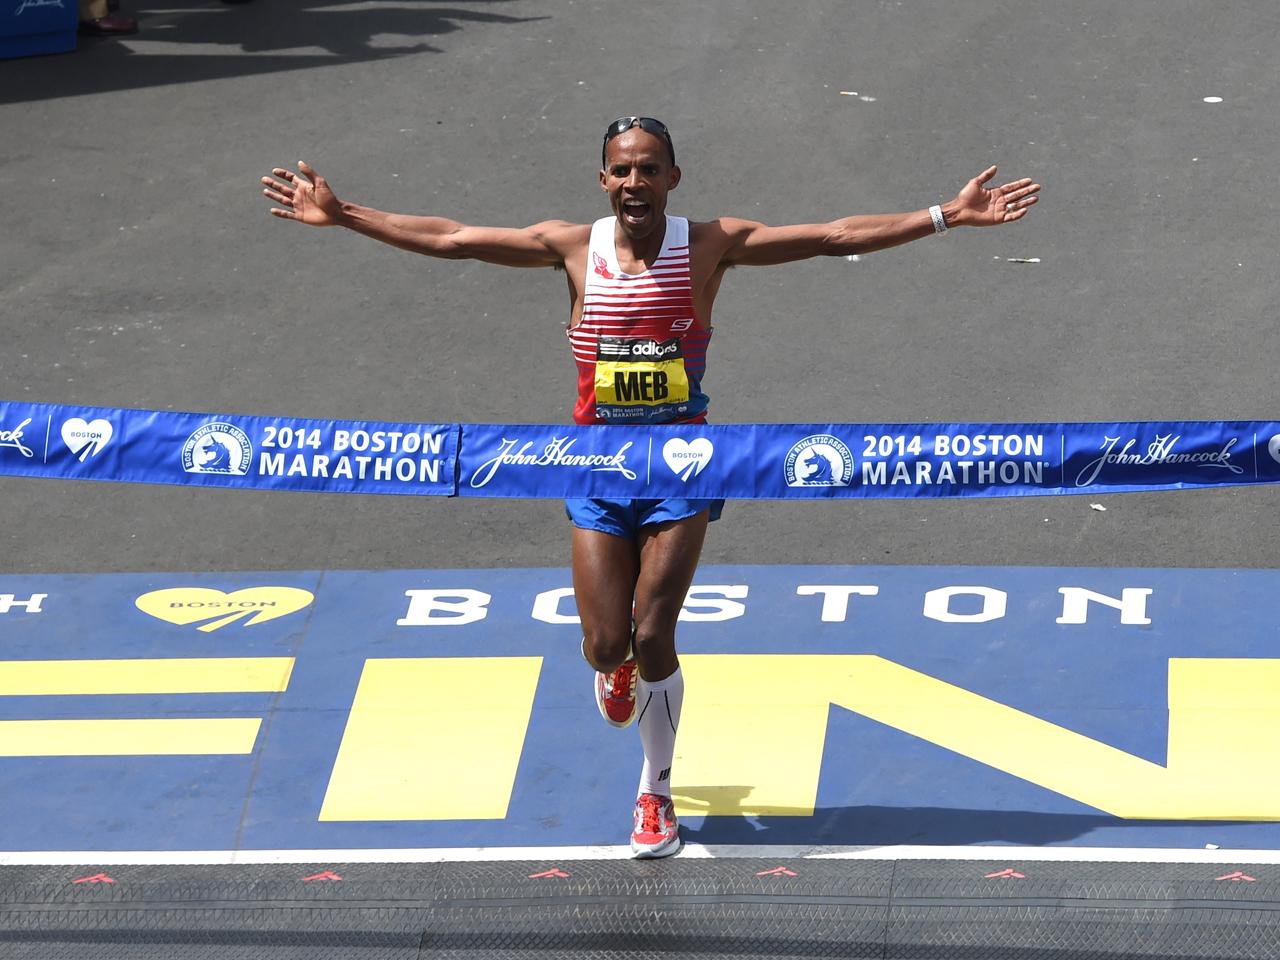 American Meb Keflezighi wins the 2014 Boston Marathon - CBS News